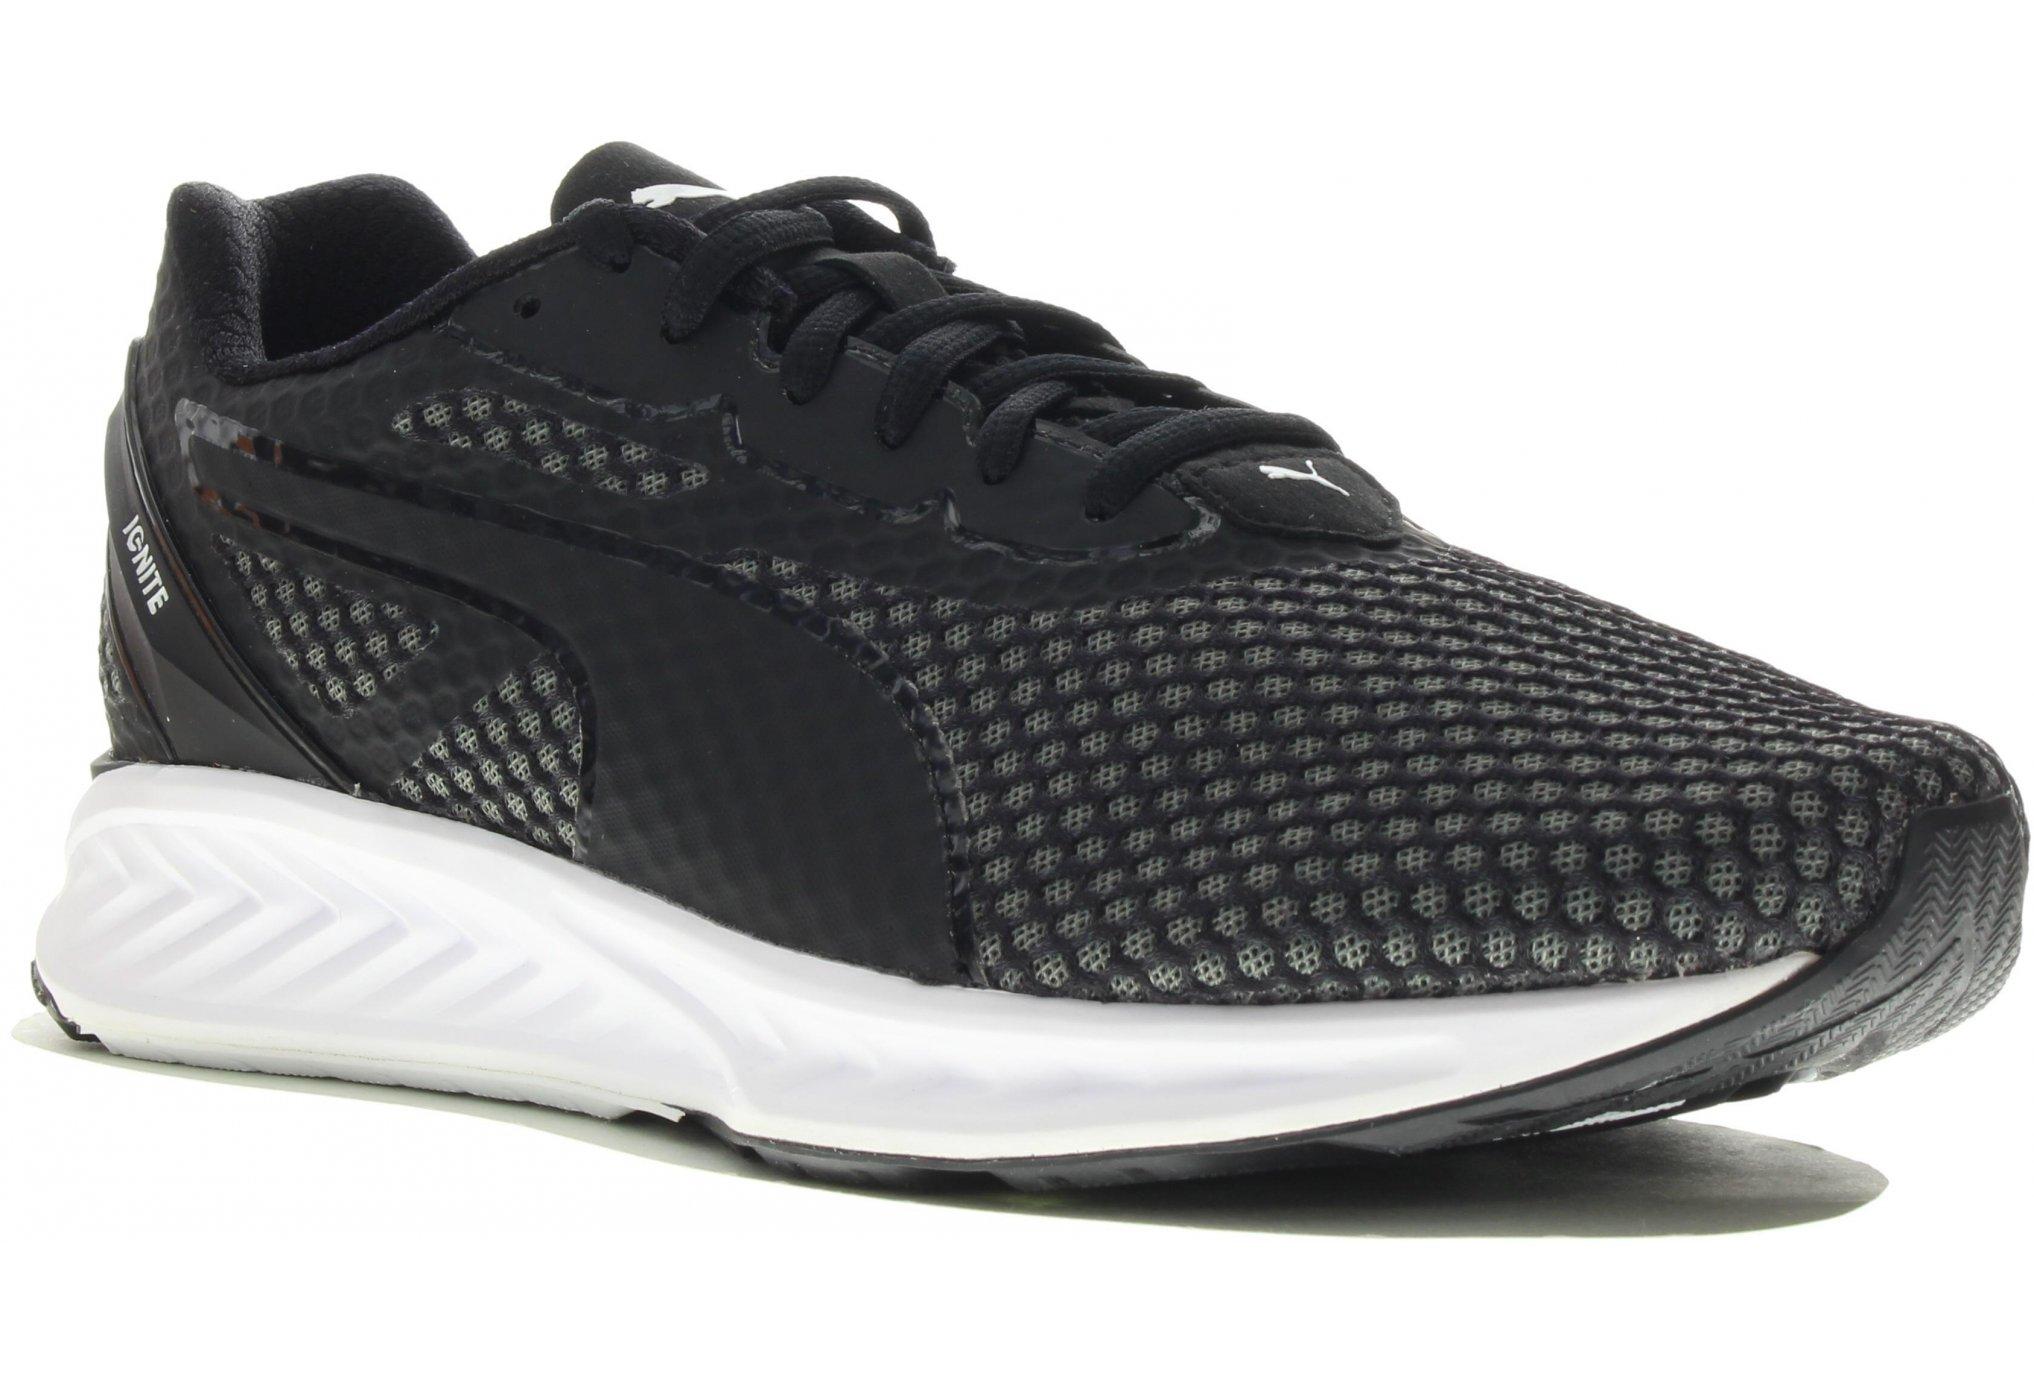 Resathlon Puma Ignite Netfit W Chaussures running femme